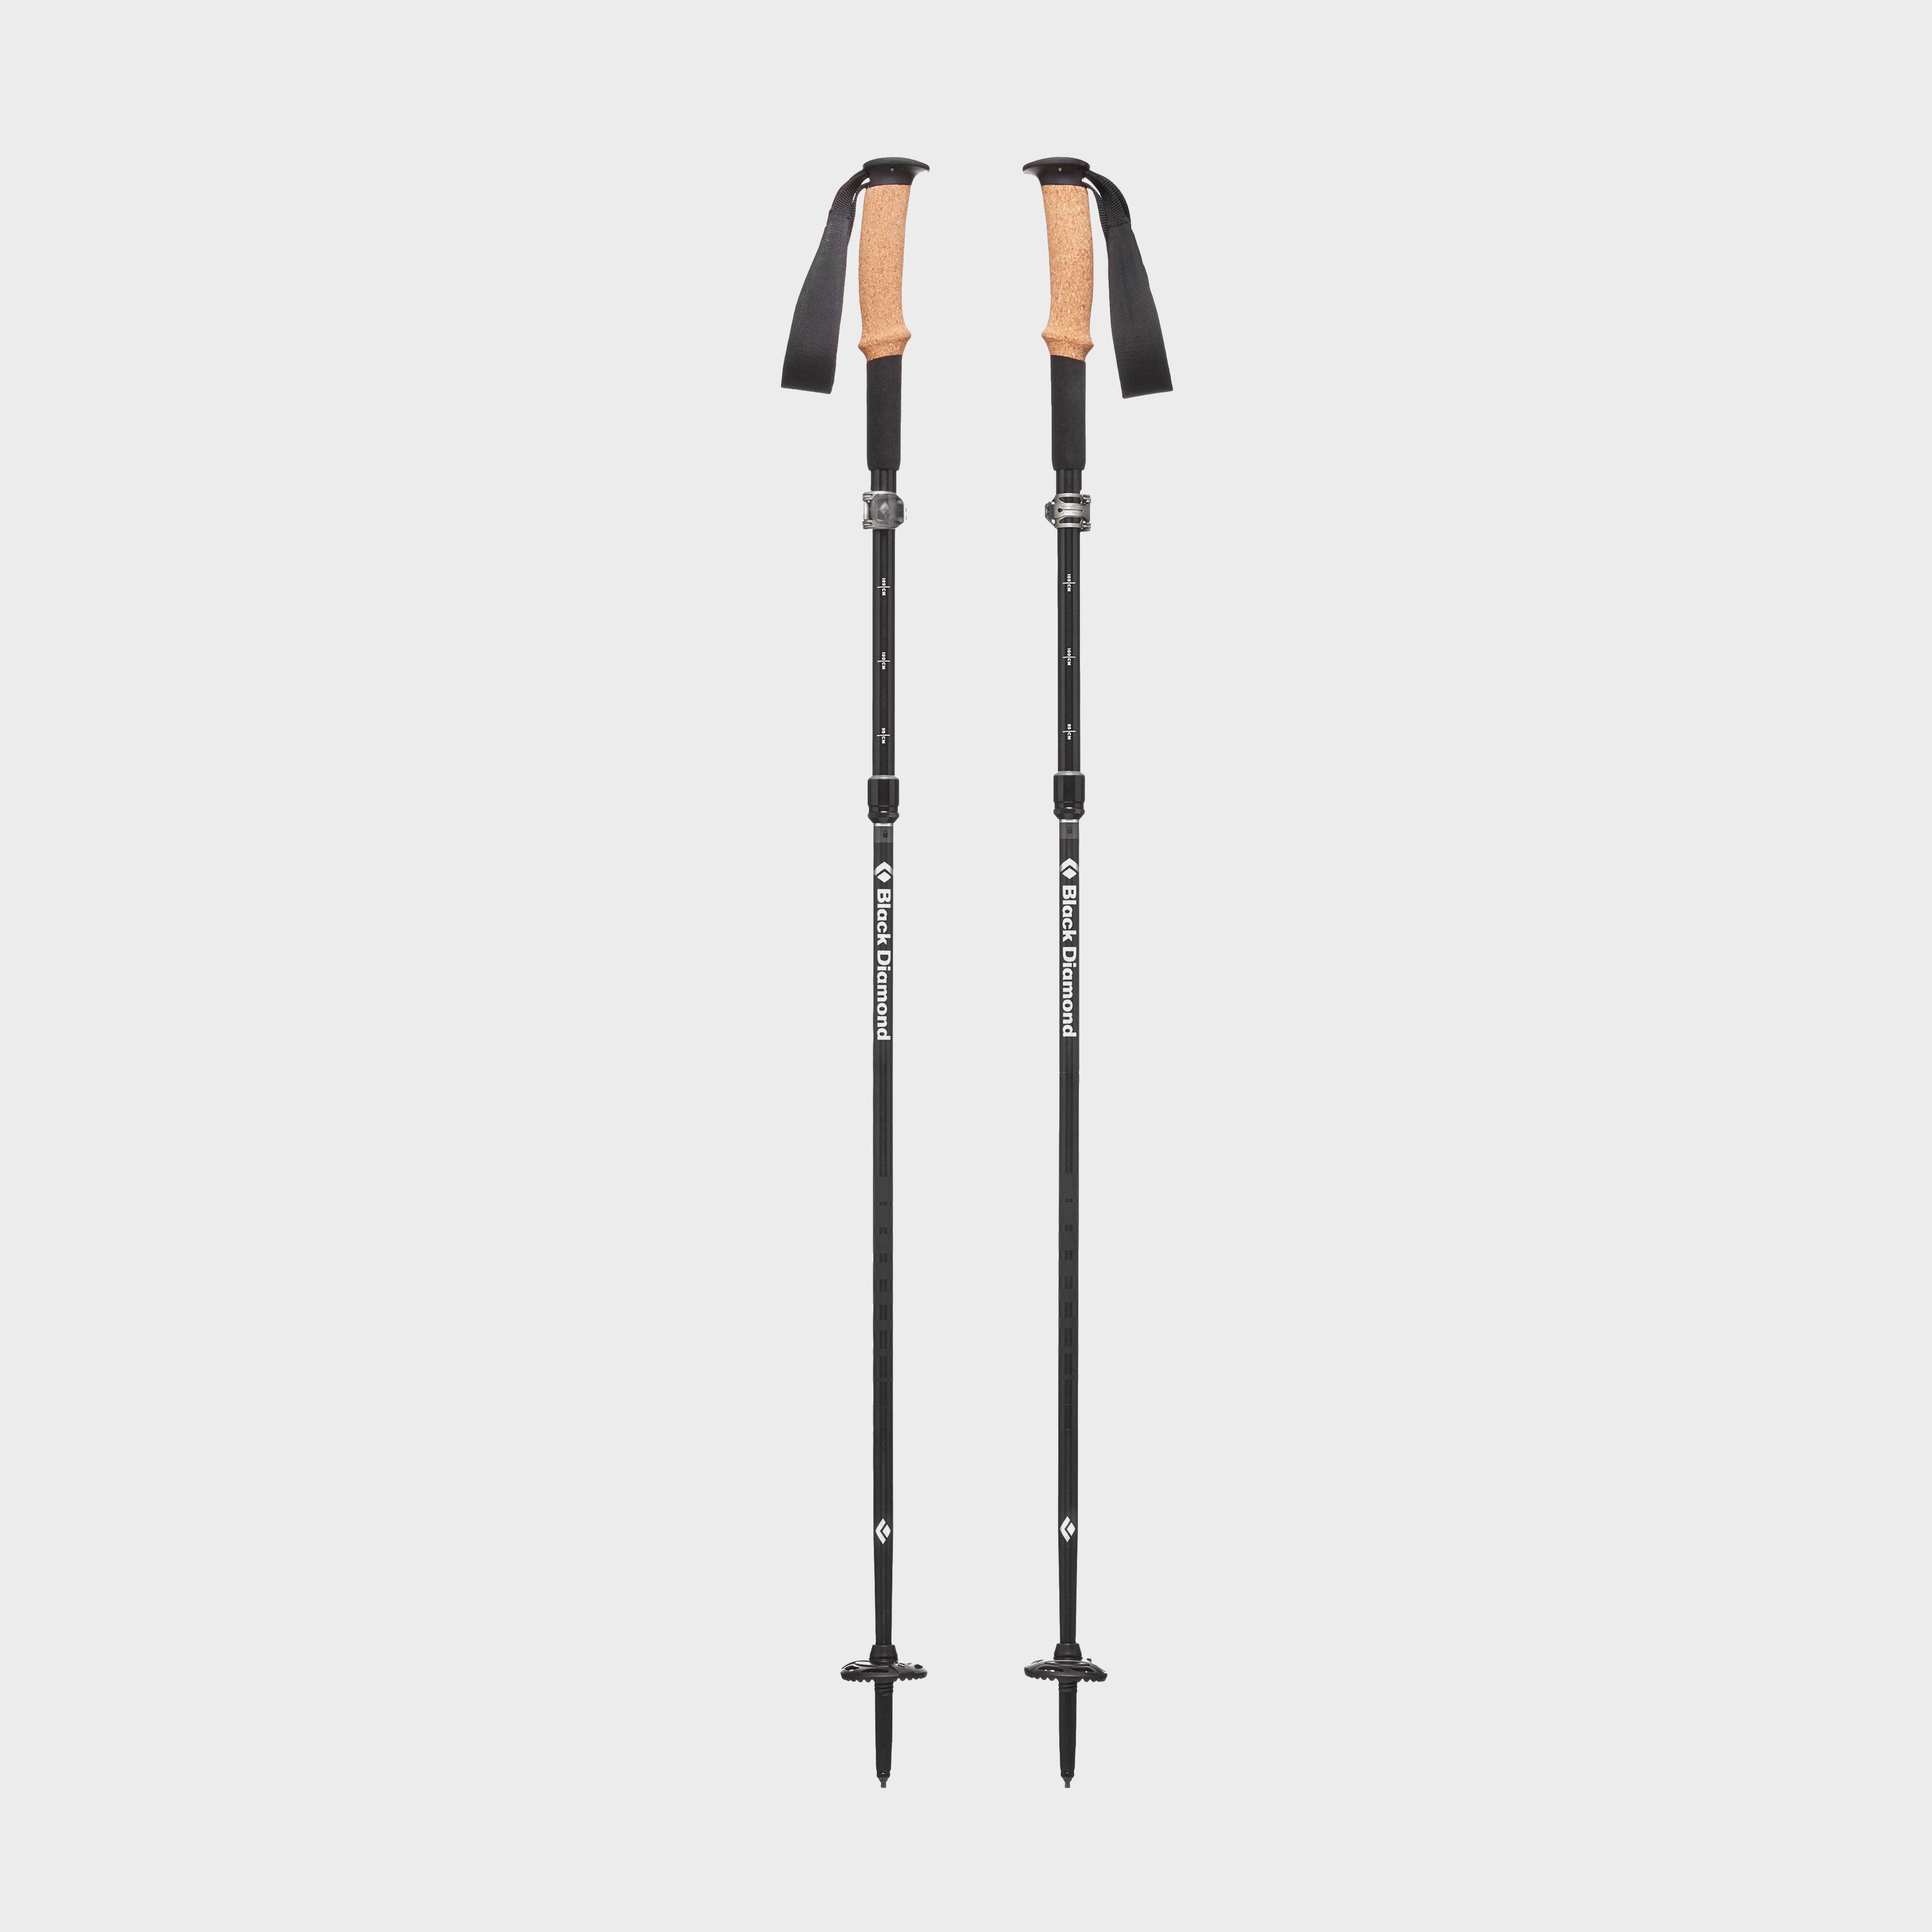 Black Diamond Alpine Flz Trekking Poles (105-125cm) - Black/105-12  Black/105-12